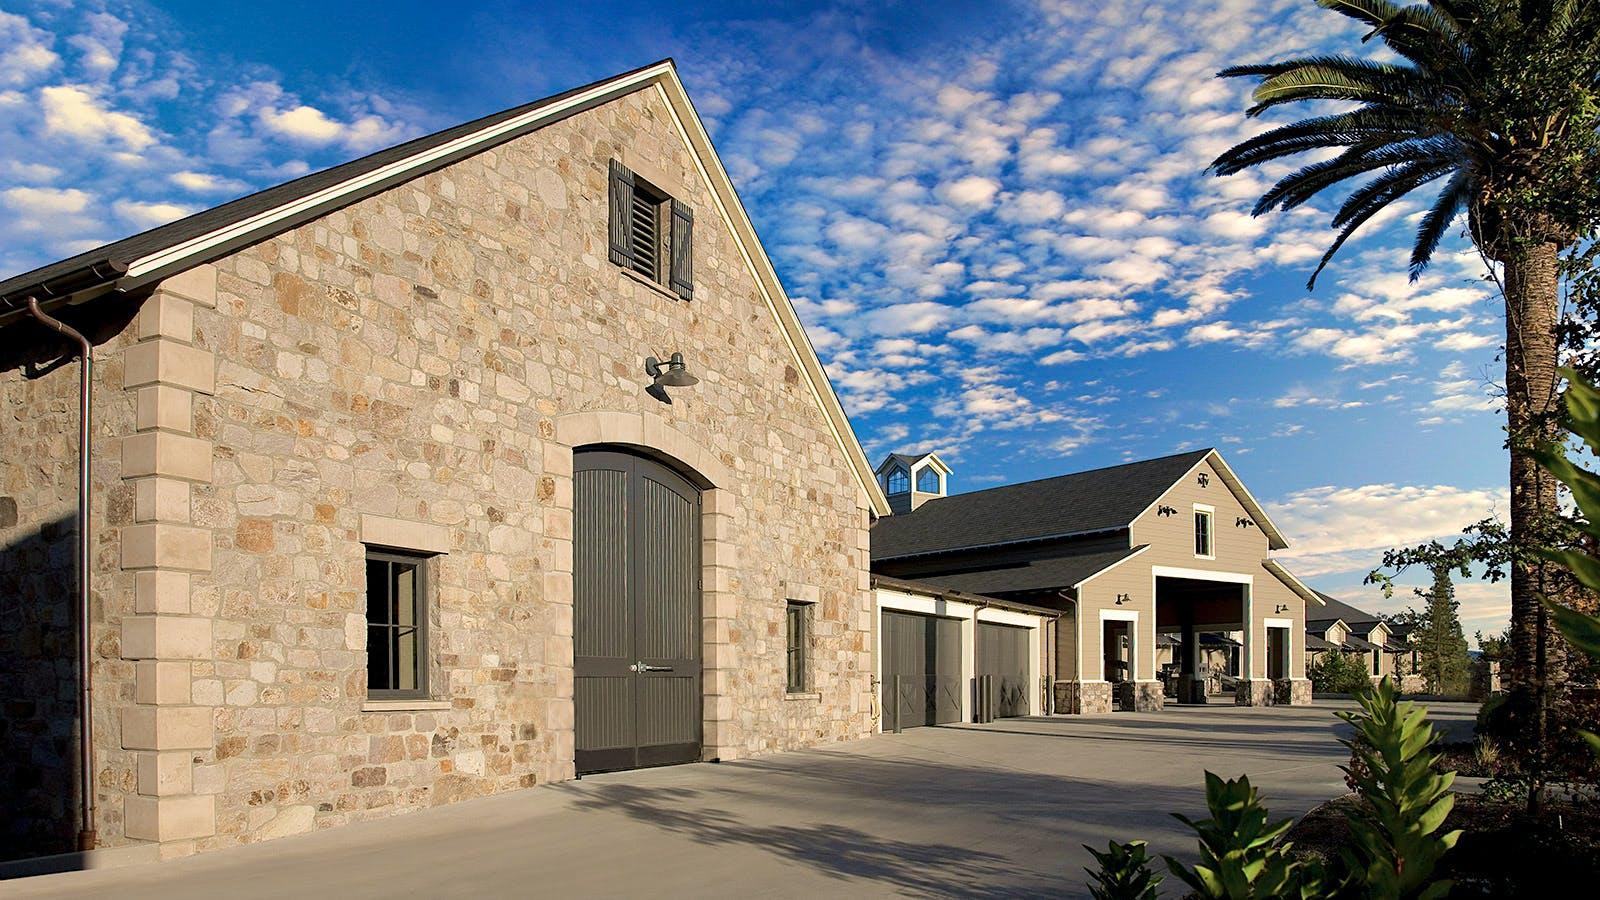 10 Cabernet Sauvignons Pit Napa Vs. Sonoma